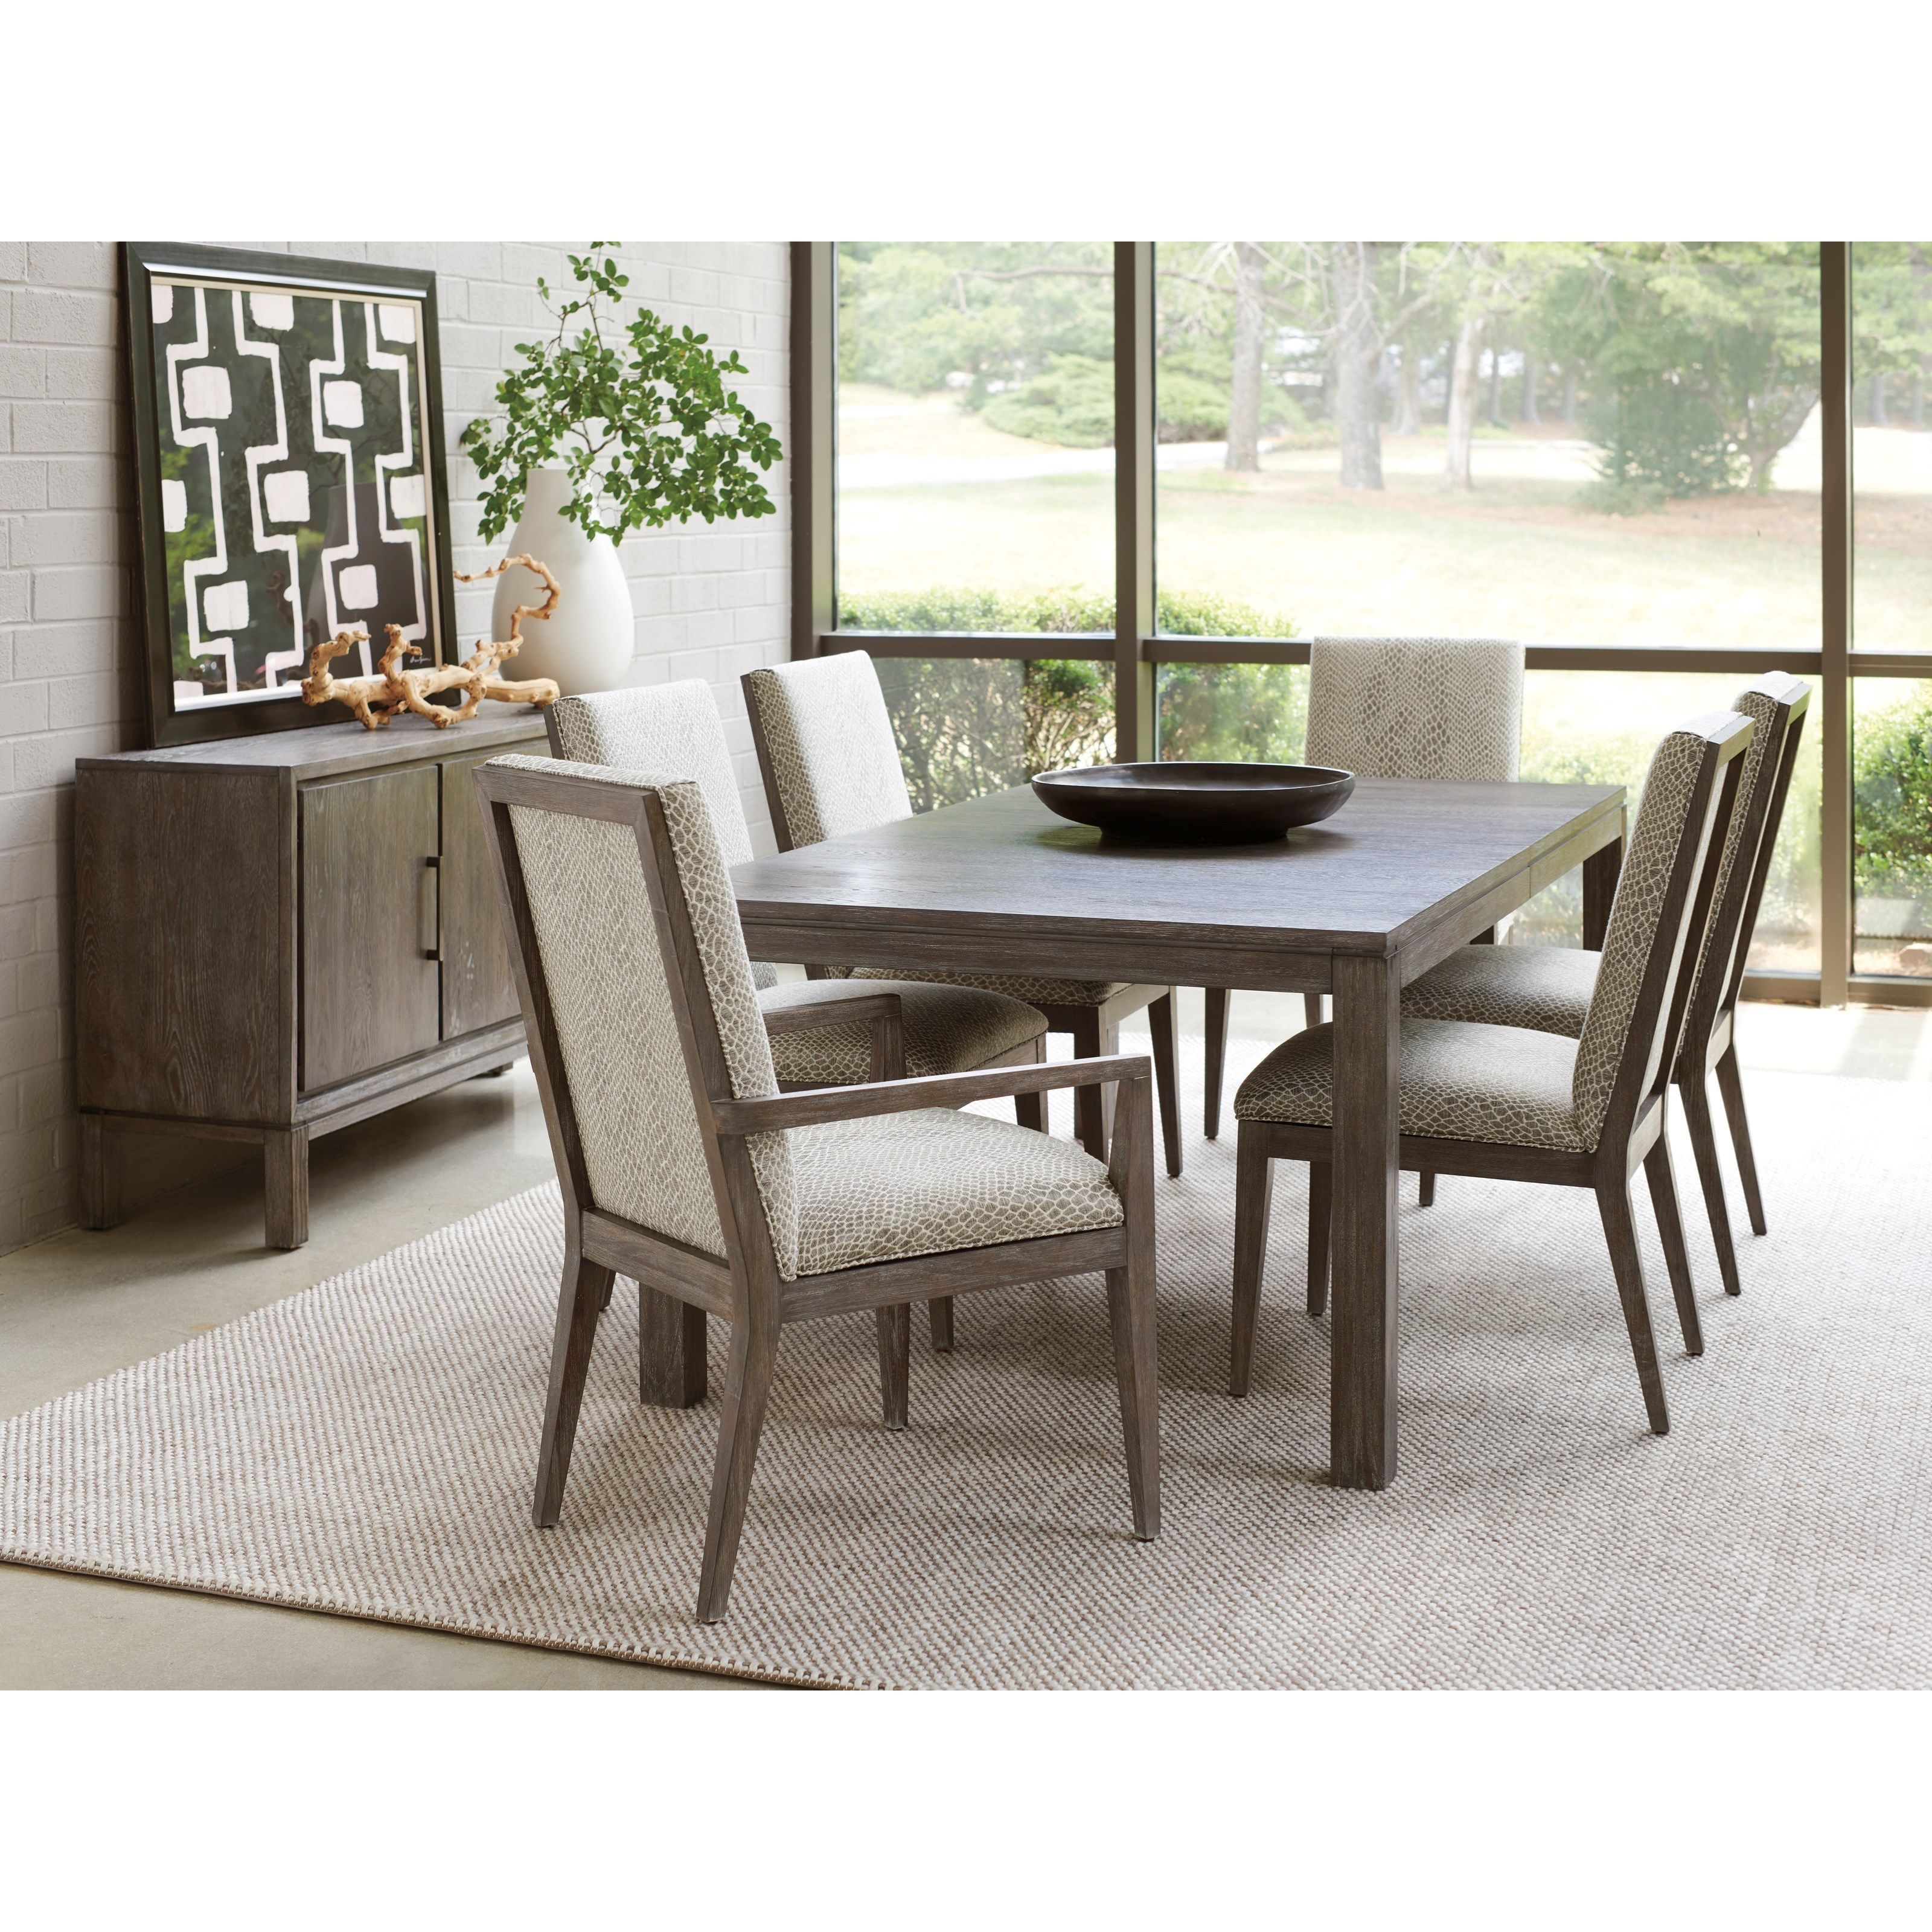 Lexington Dining Room Furniture: Lexington Santana Seven Piece Dining Set With Marin Table